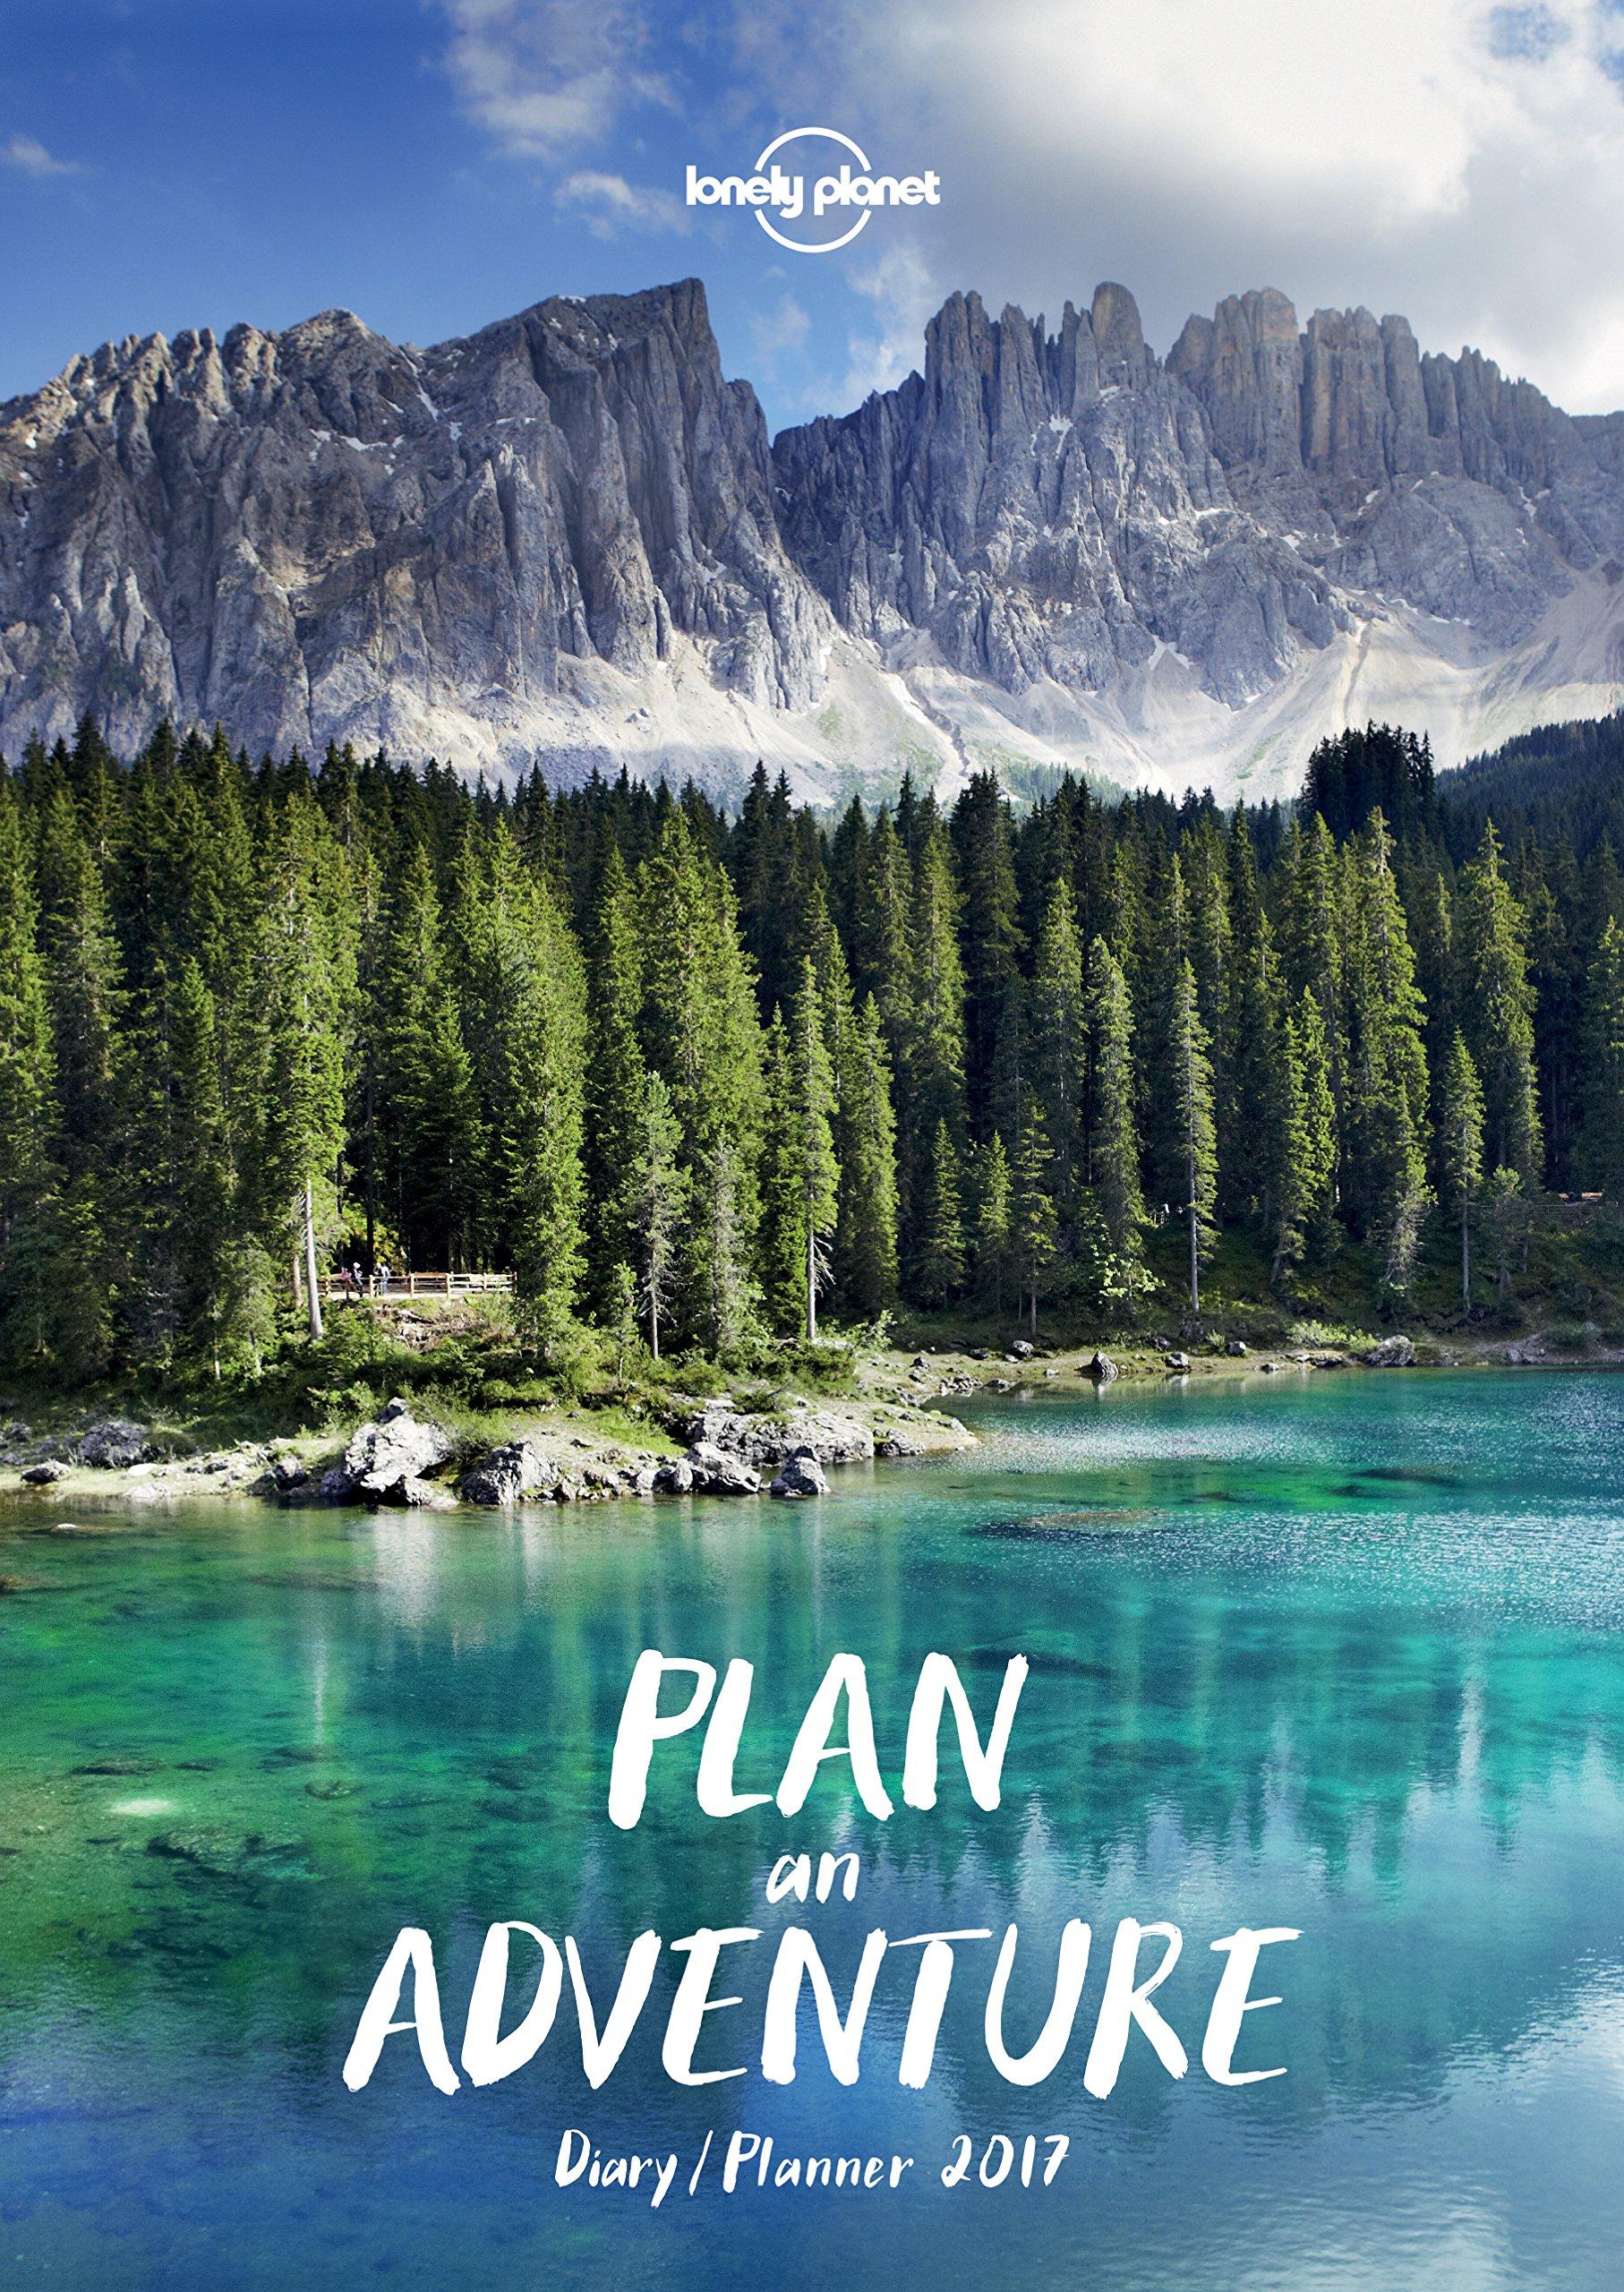 Plan an Adventure, Diary / Planner 2017 (Diaries 2017)